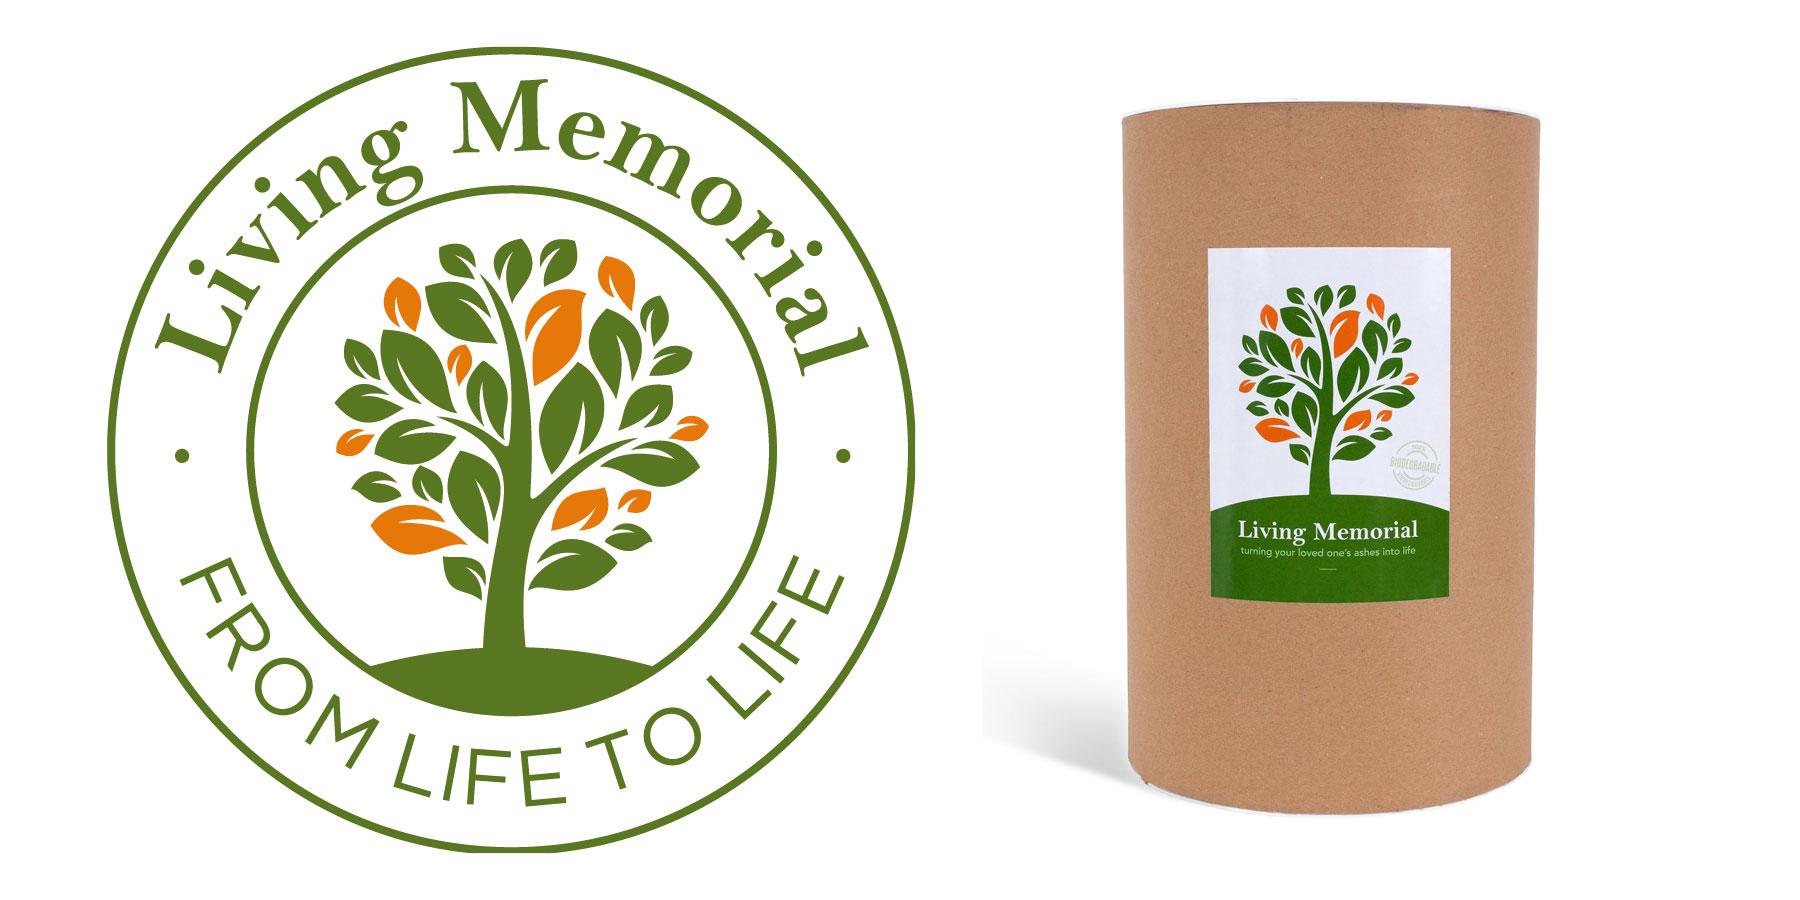 Living Memorial tree planting